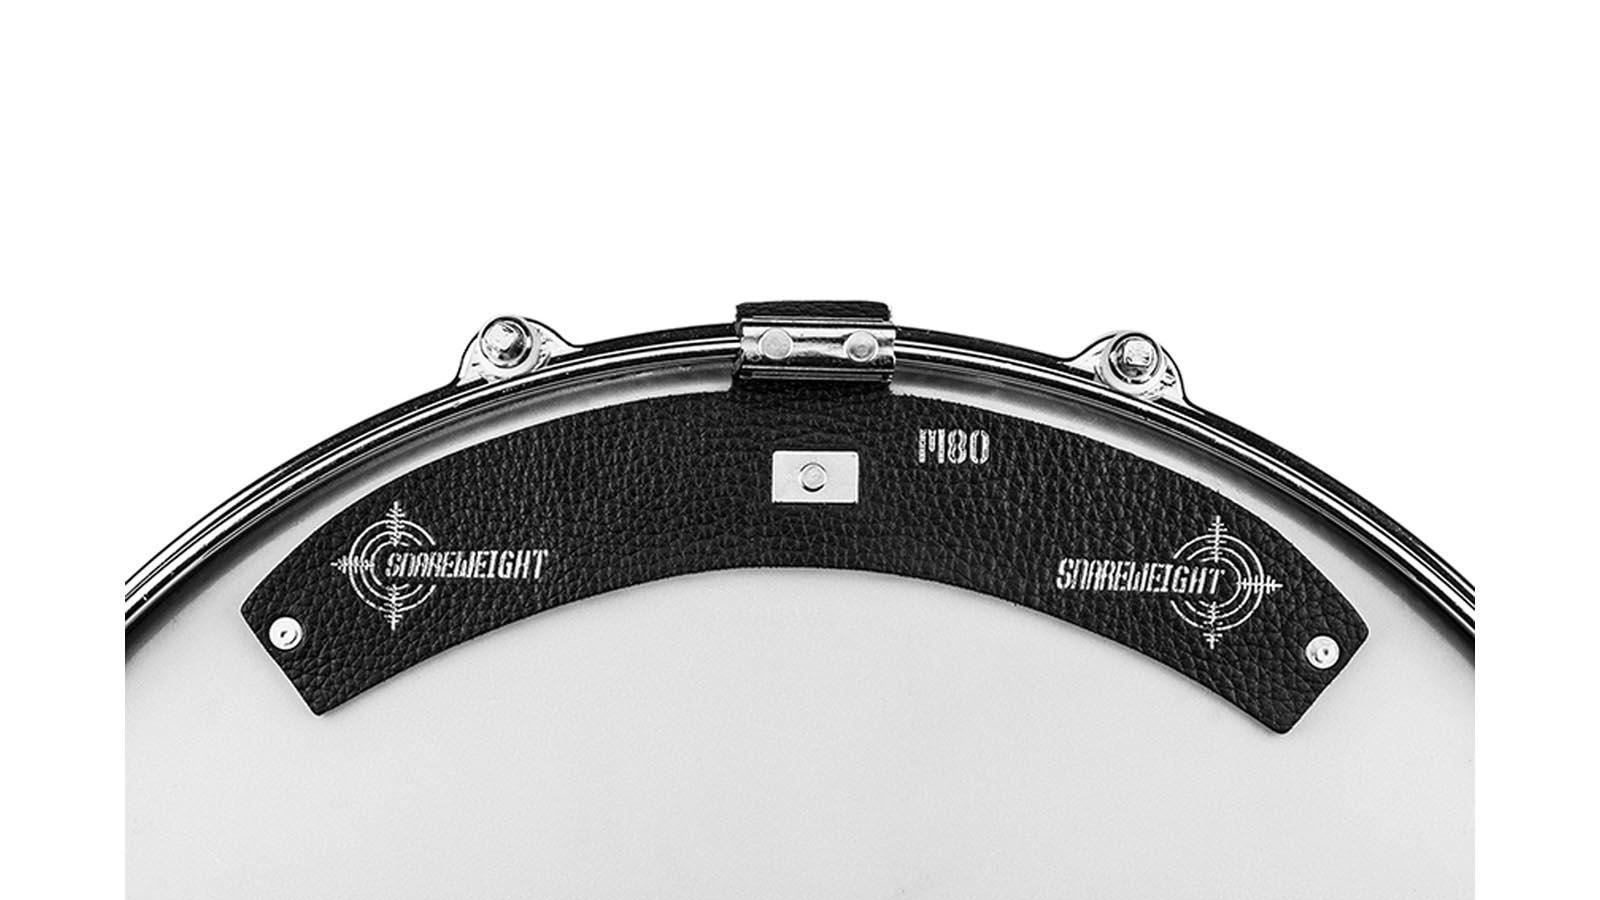 Snareweight Snaredämpfer groß M80